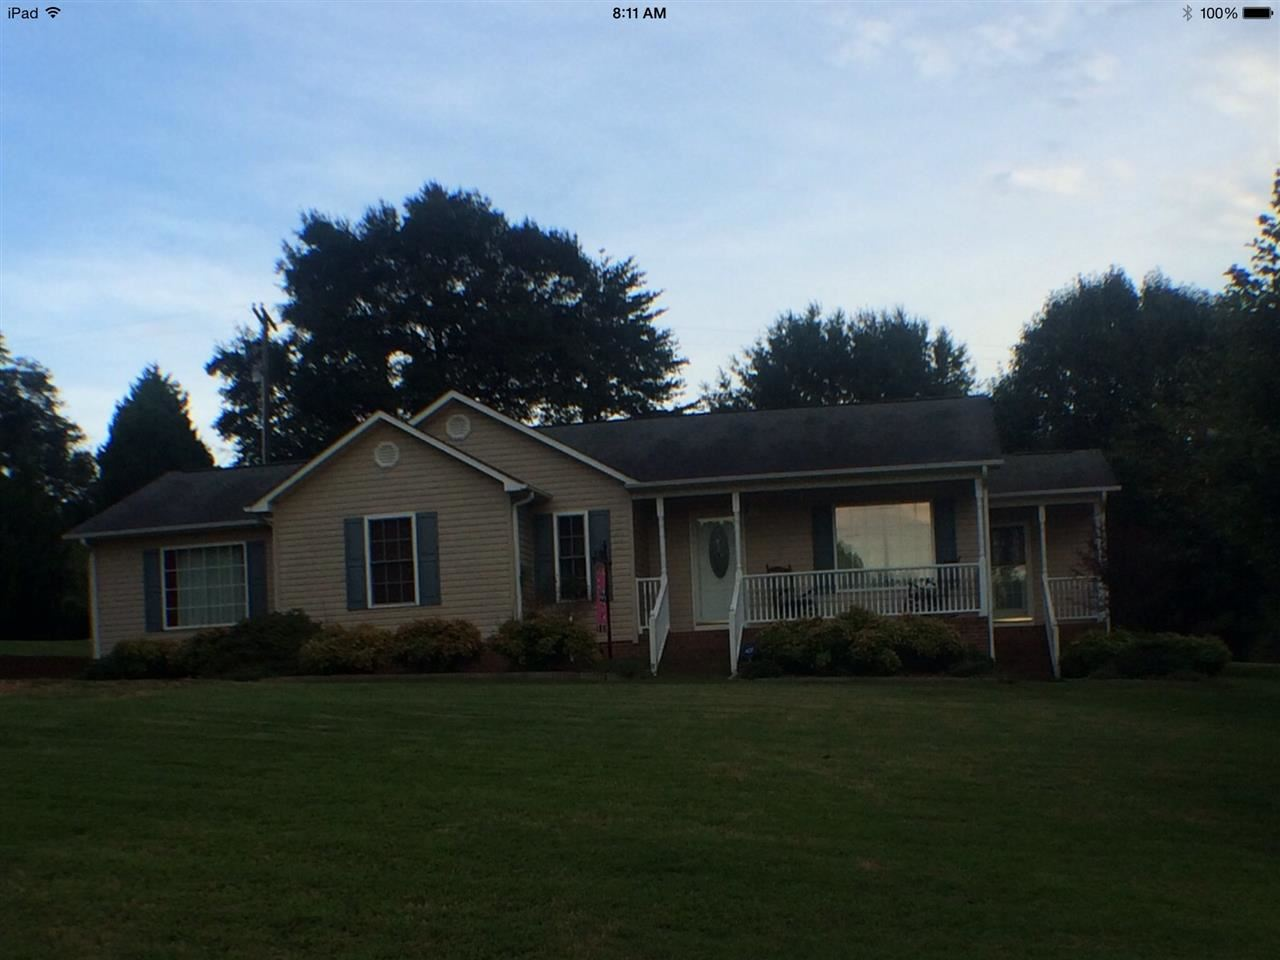 479 Ballard Rd, Pelzer, SC 29669